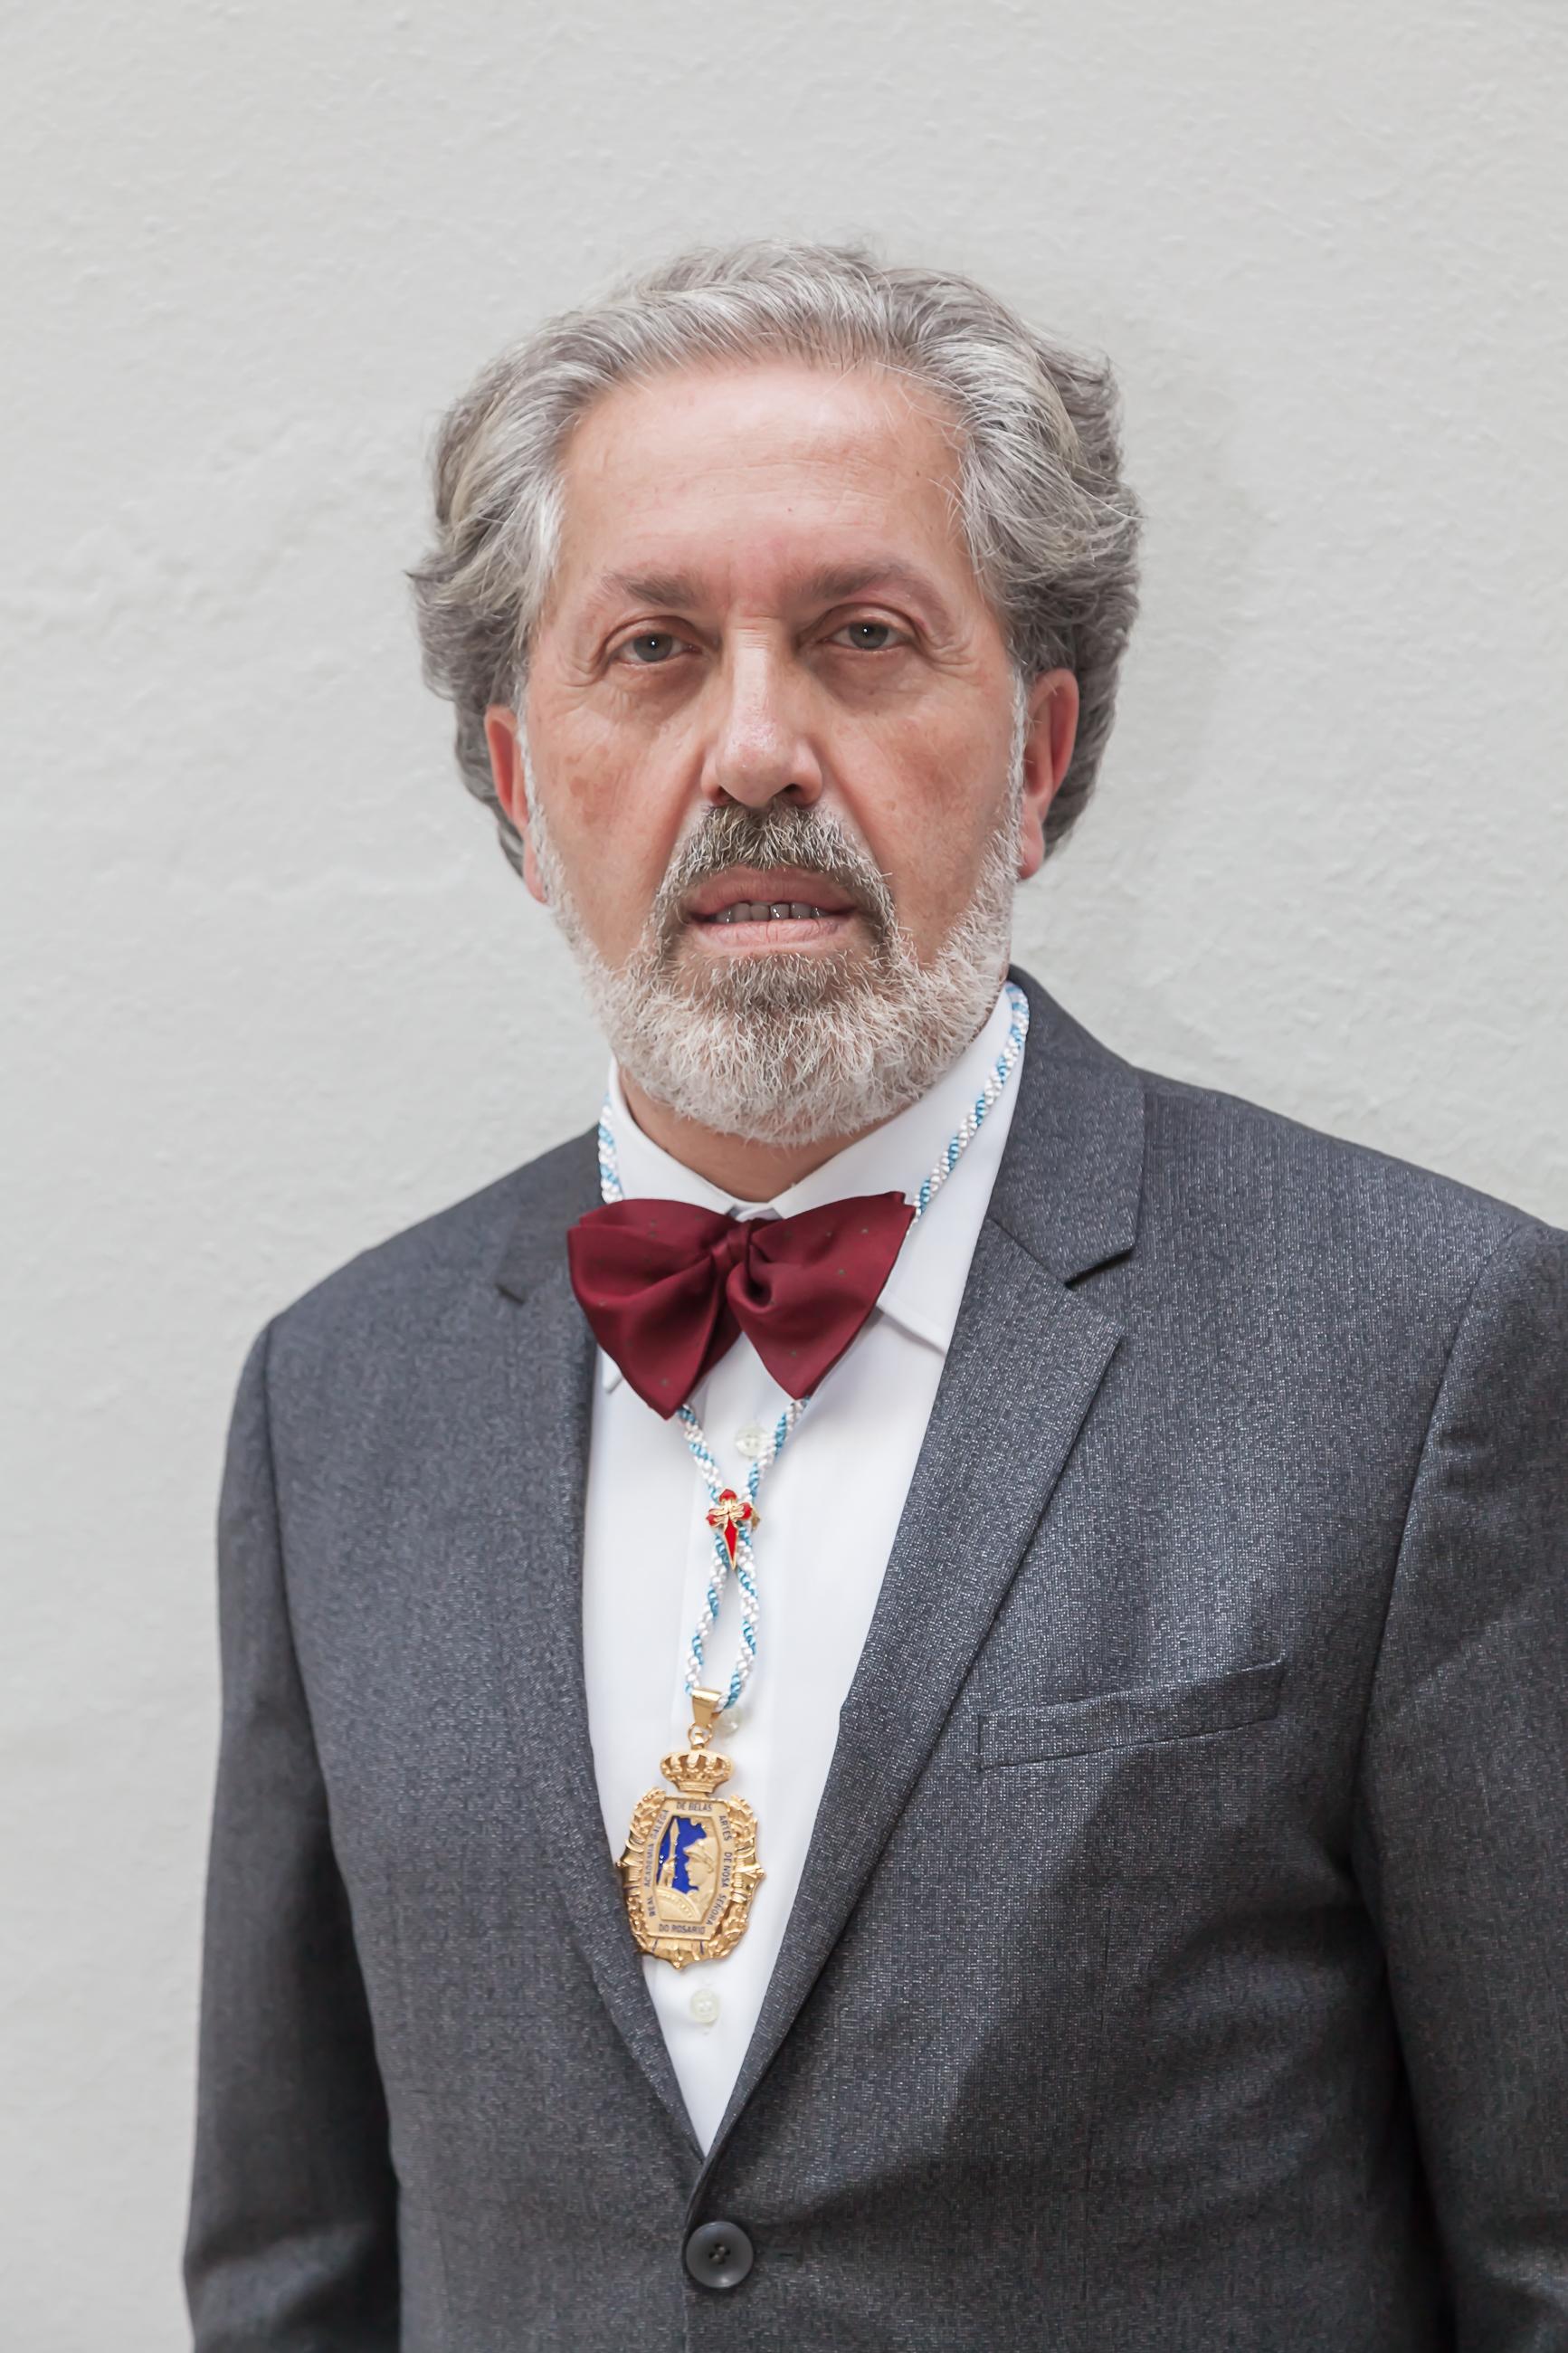 Ingreso de J. Durán na Real Academia Galega de Belas Artes